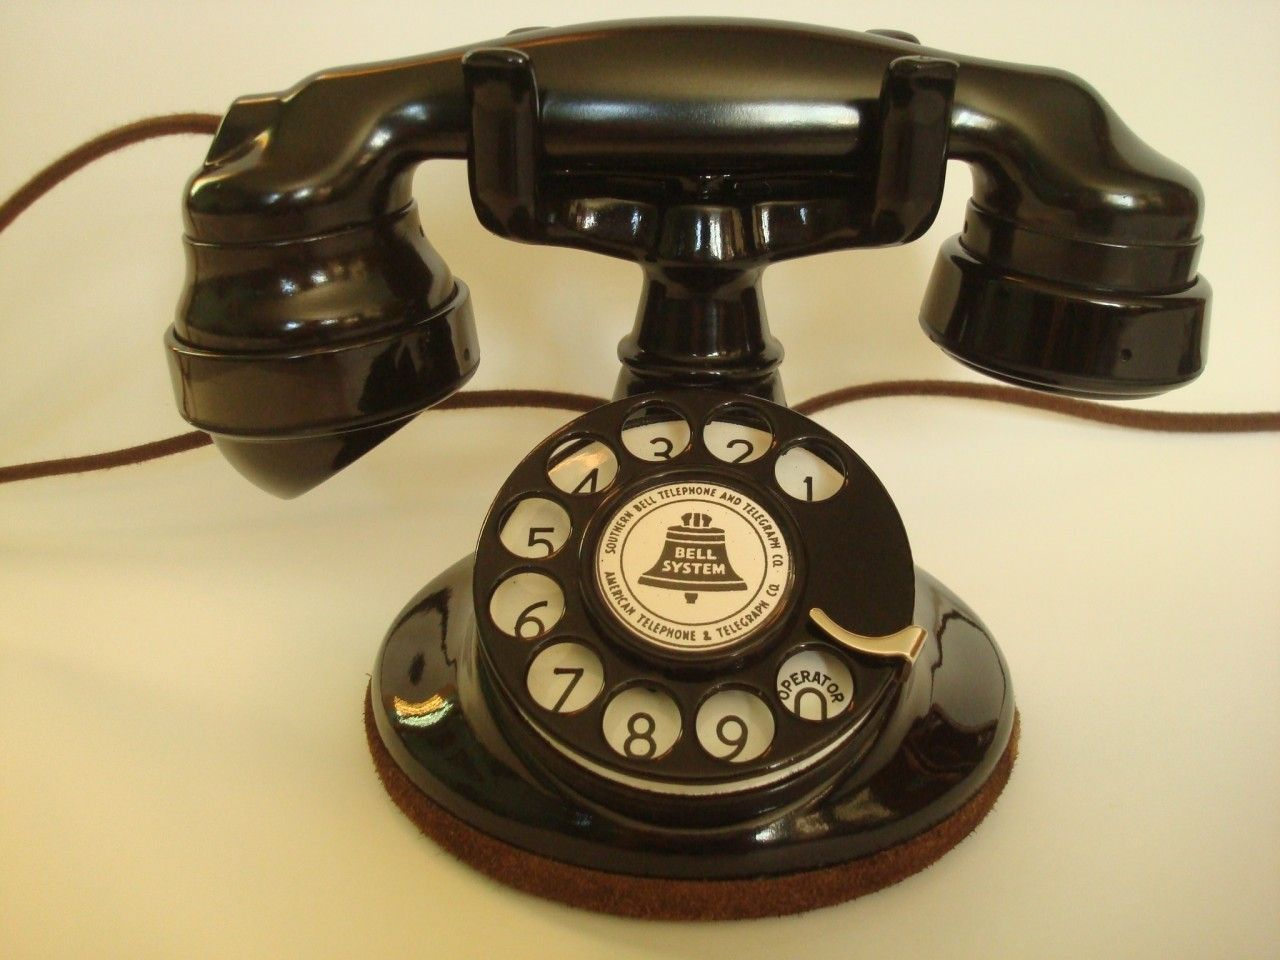 vintage telephones western electric 102 telephone antique telephone [ 1280 x 960 Pixel ]